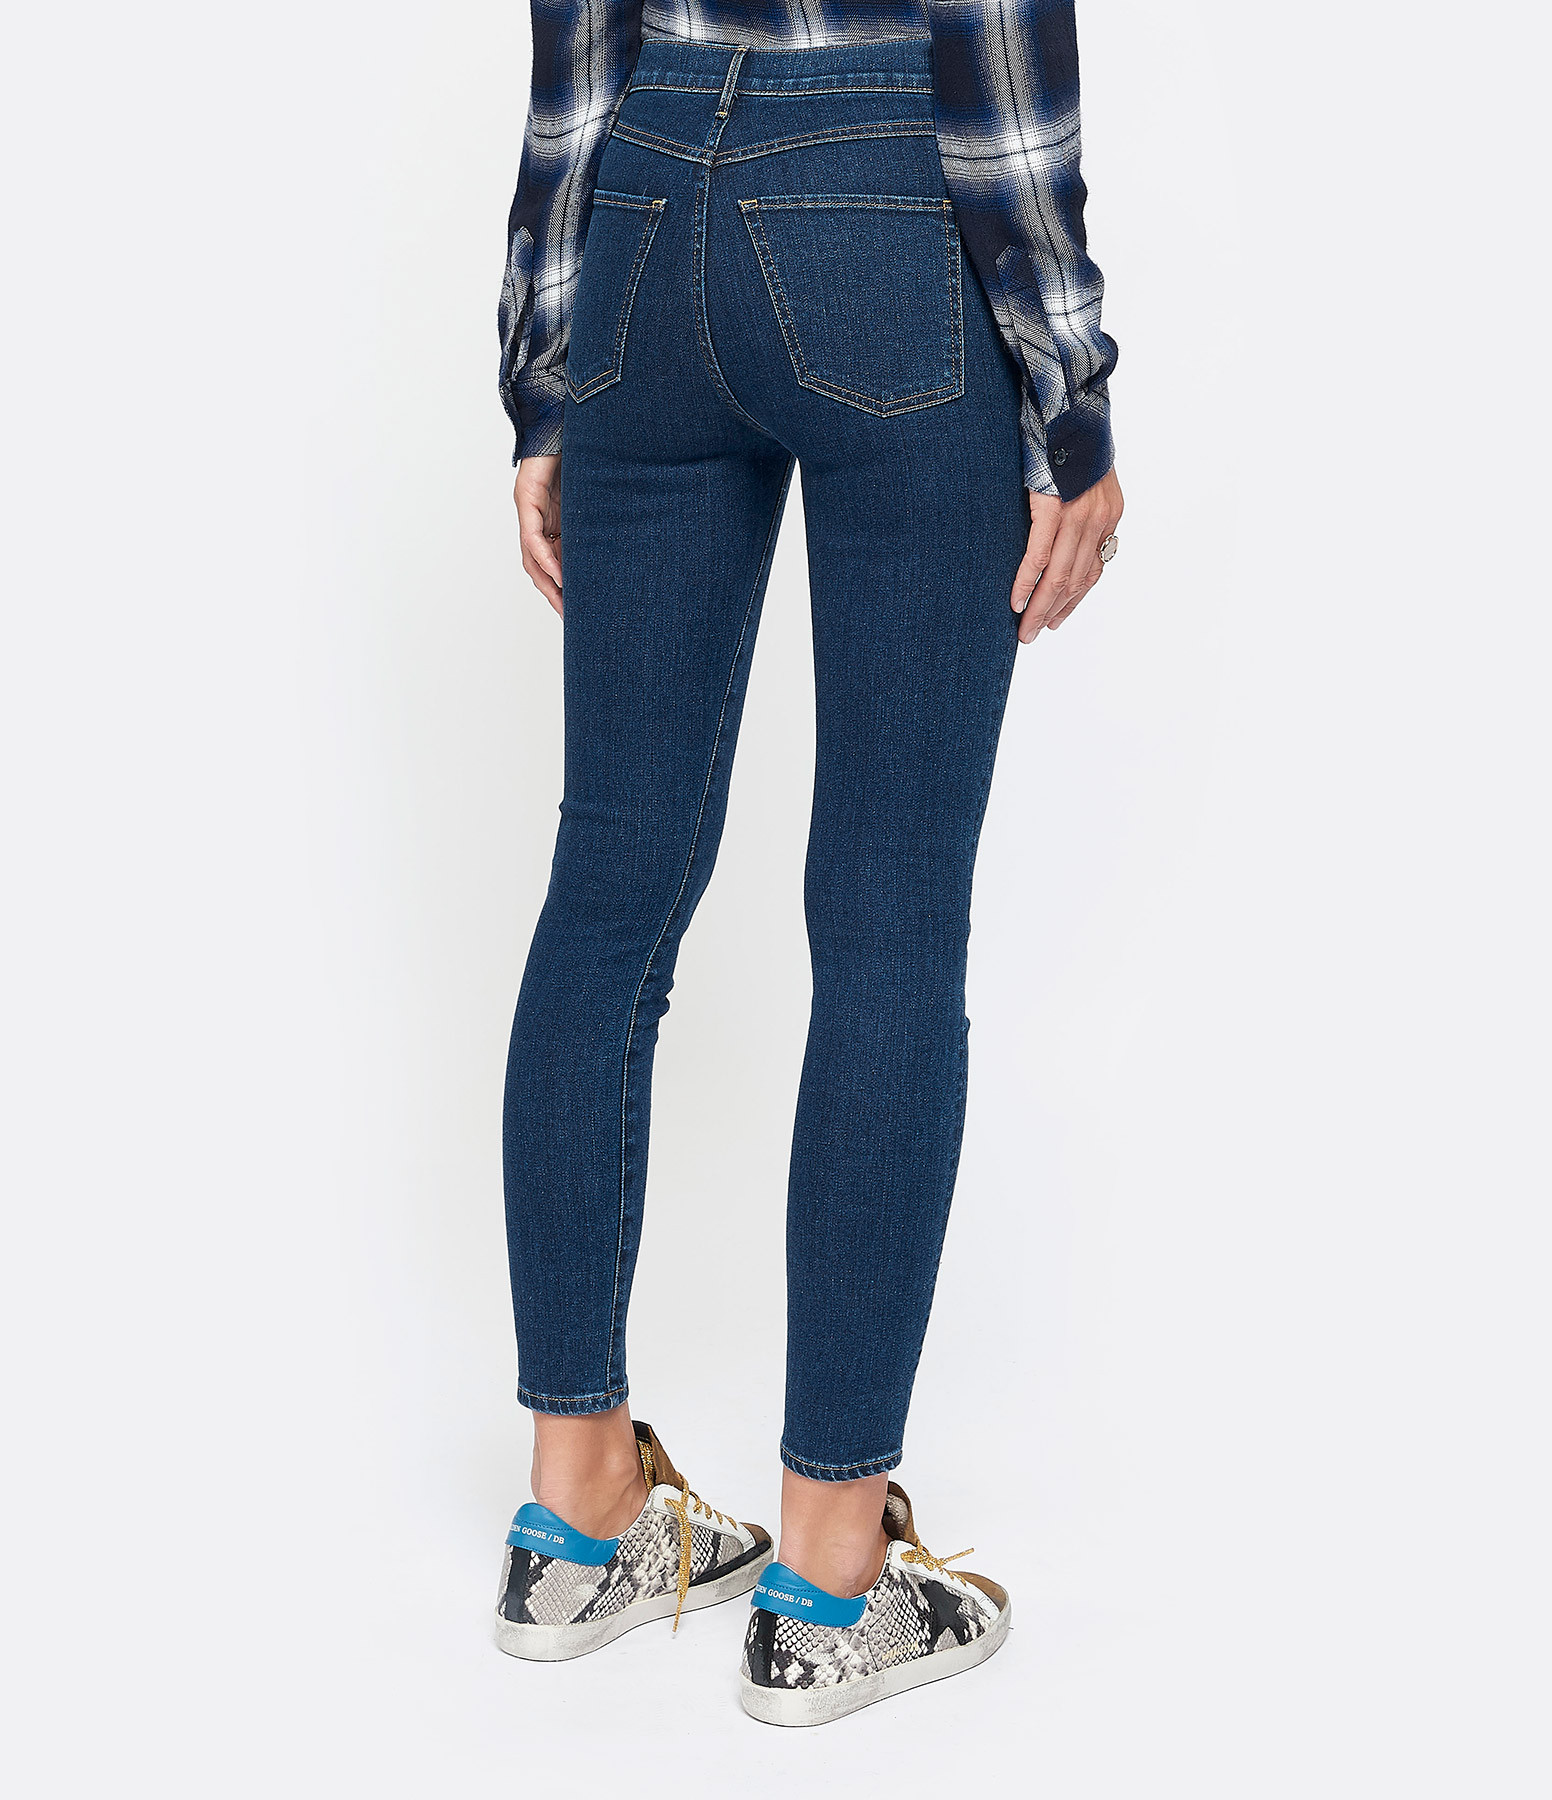 3x1 - Jean Skinny Taille Haute Denim Clio